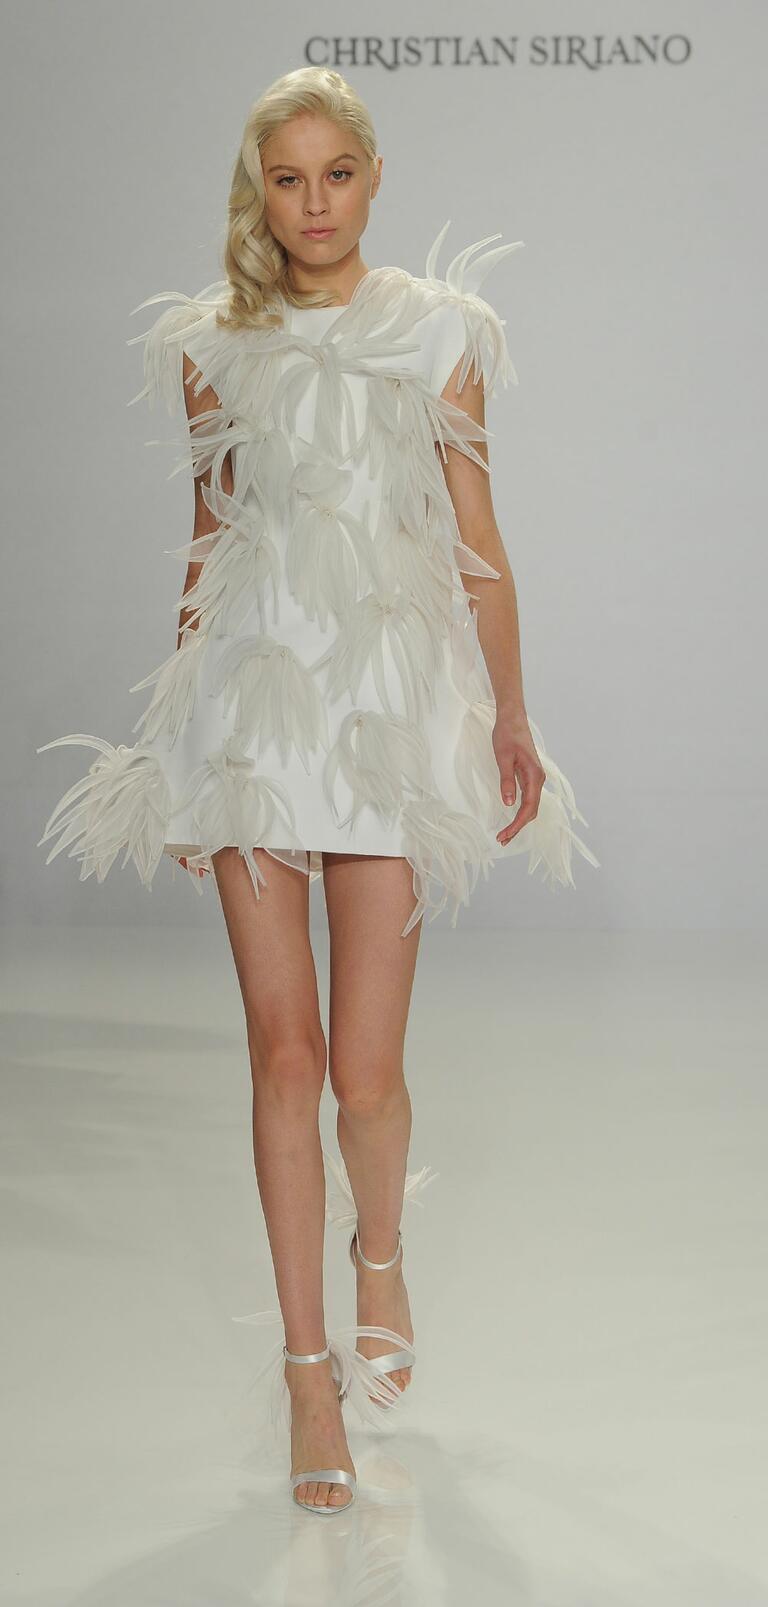 Christian Siriano Spring 2017 appliqué mini wedding dress